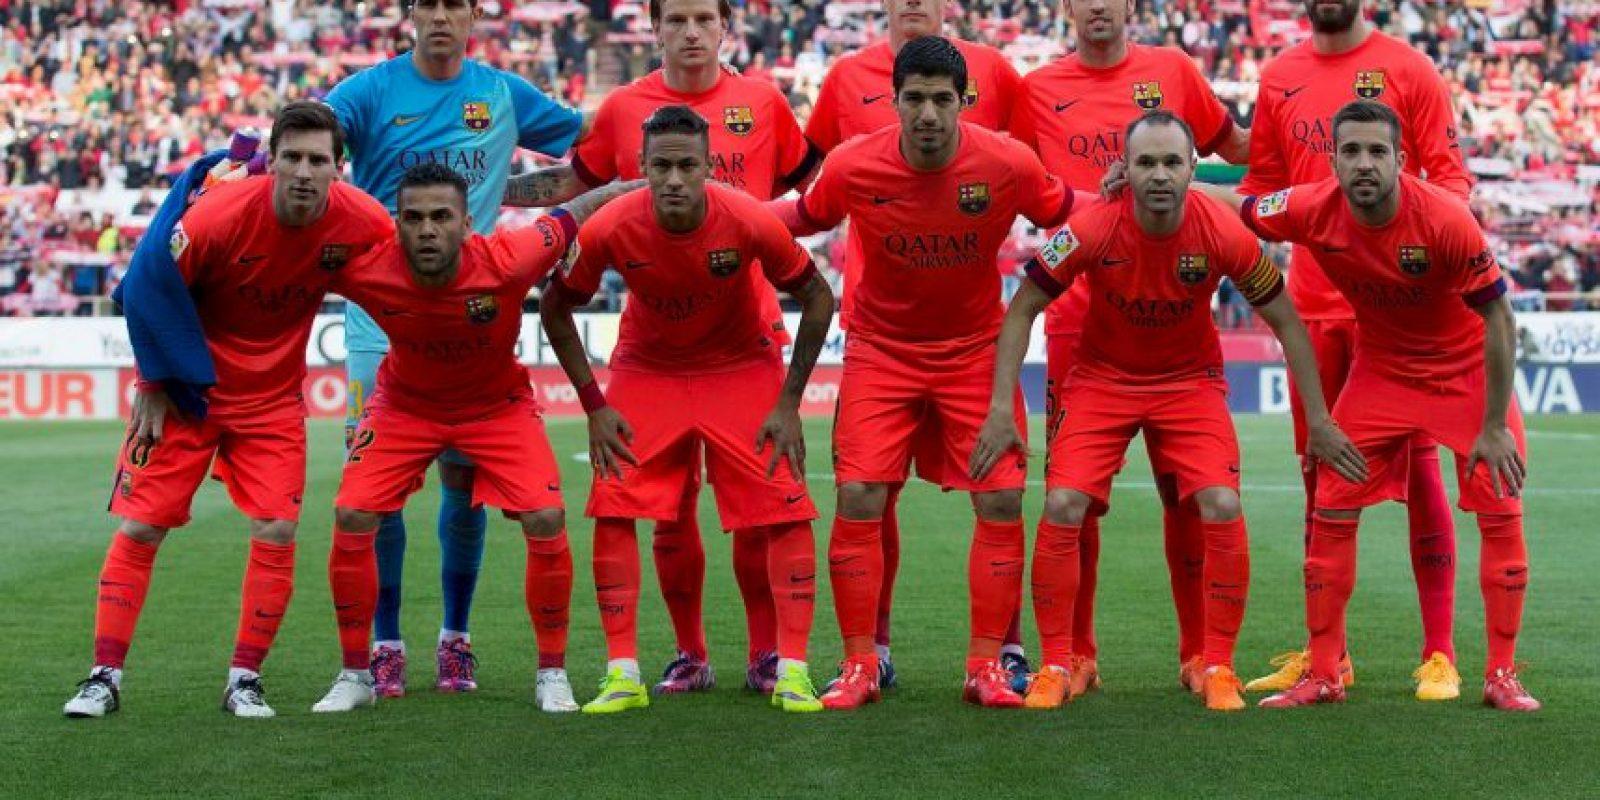 Barcelona llega a cuartos de final por octava ocasión consecutiva Foto:Getty Images